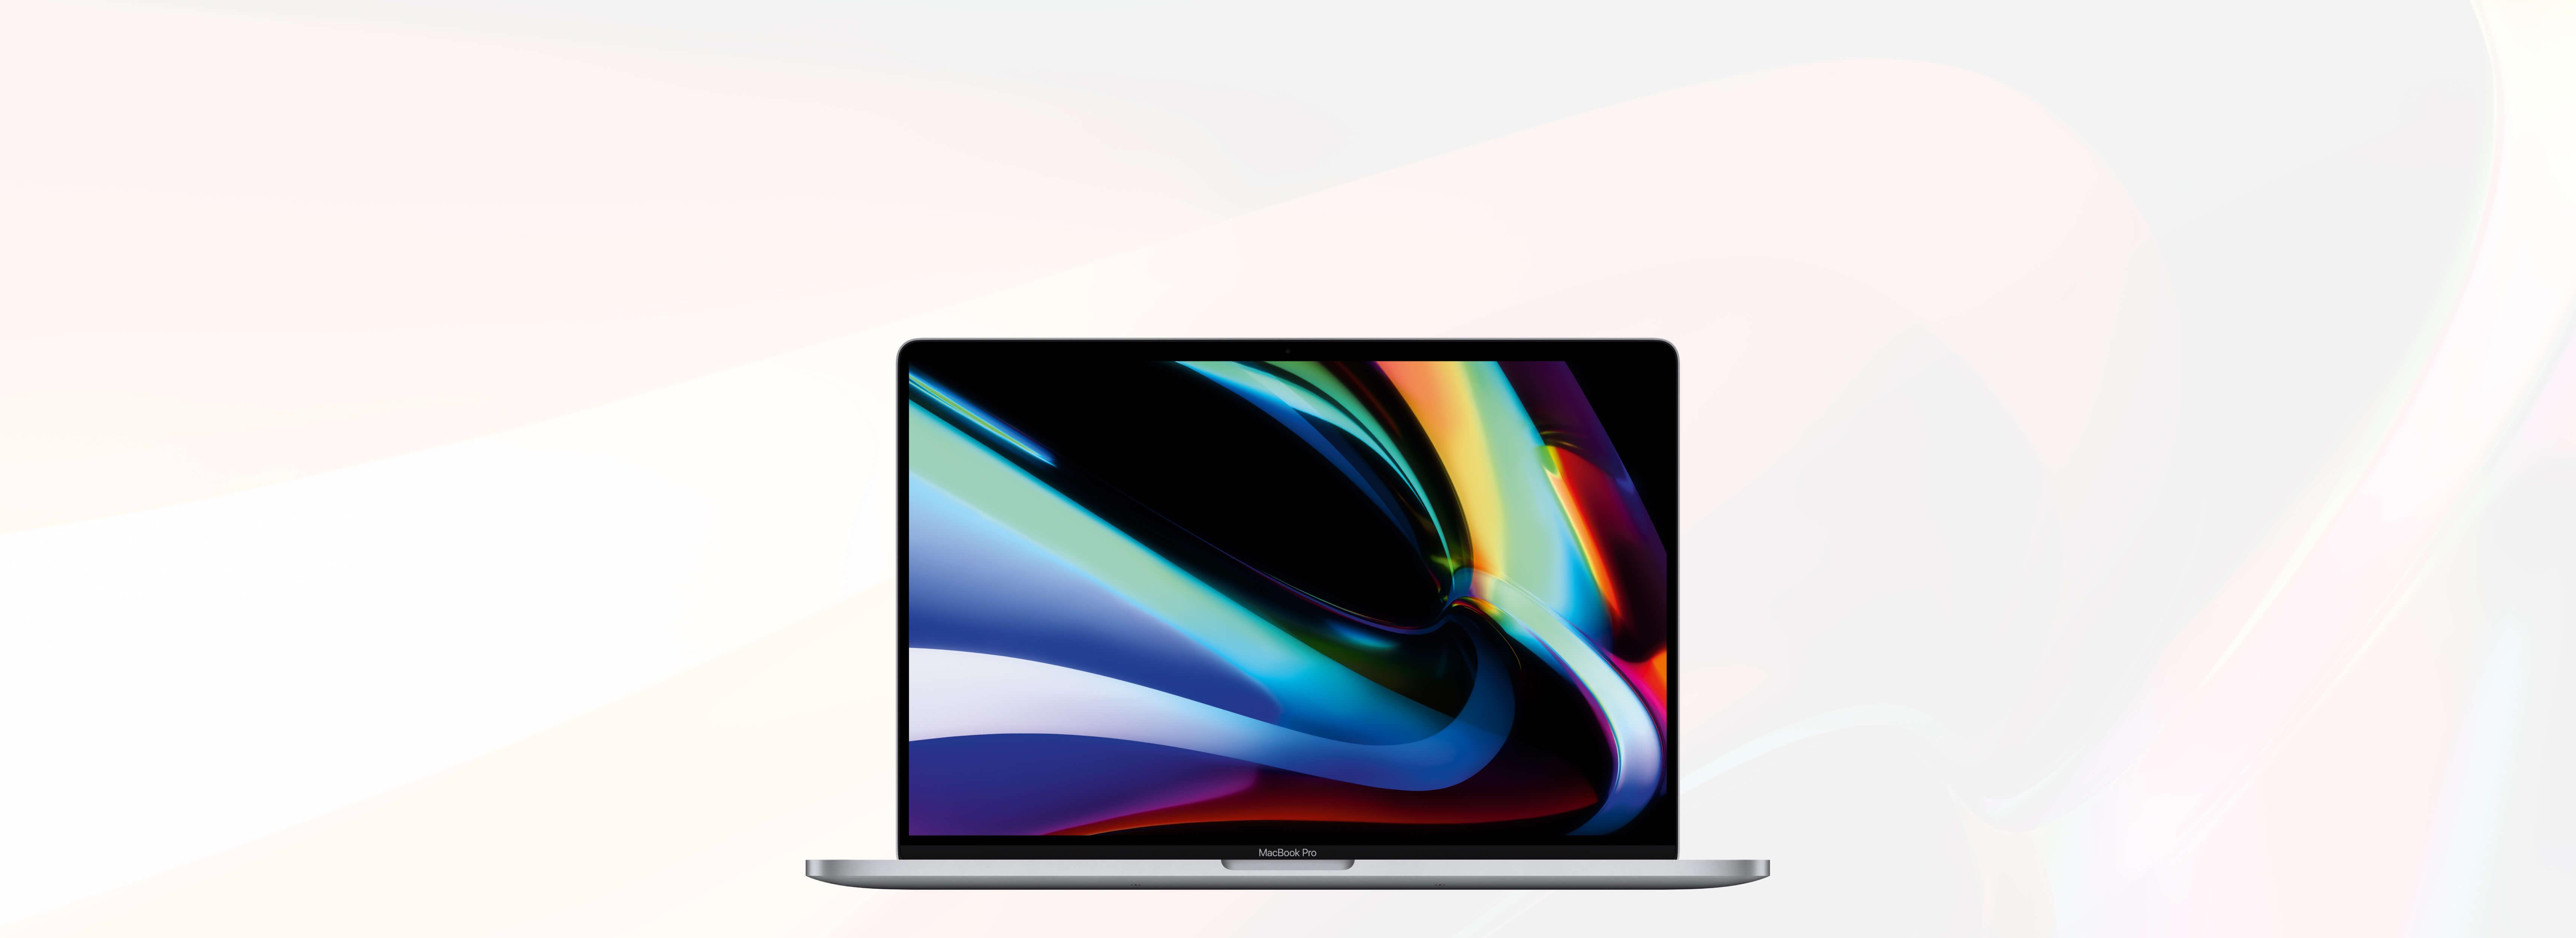 MacBook Pro 16 (Main)